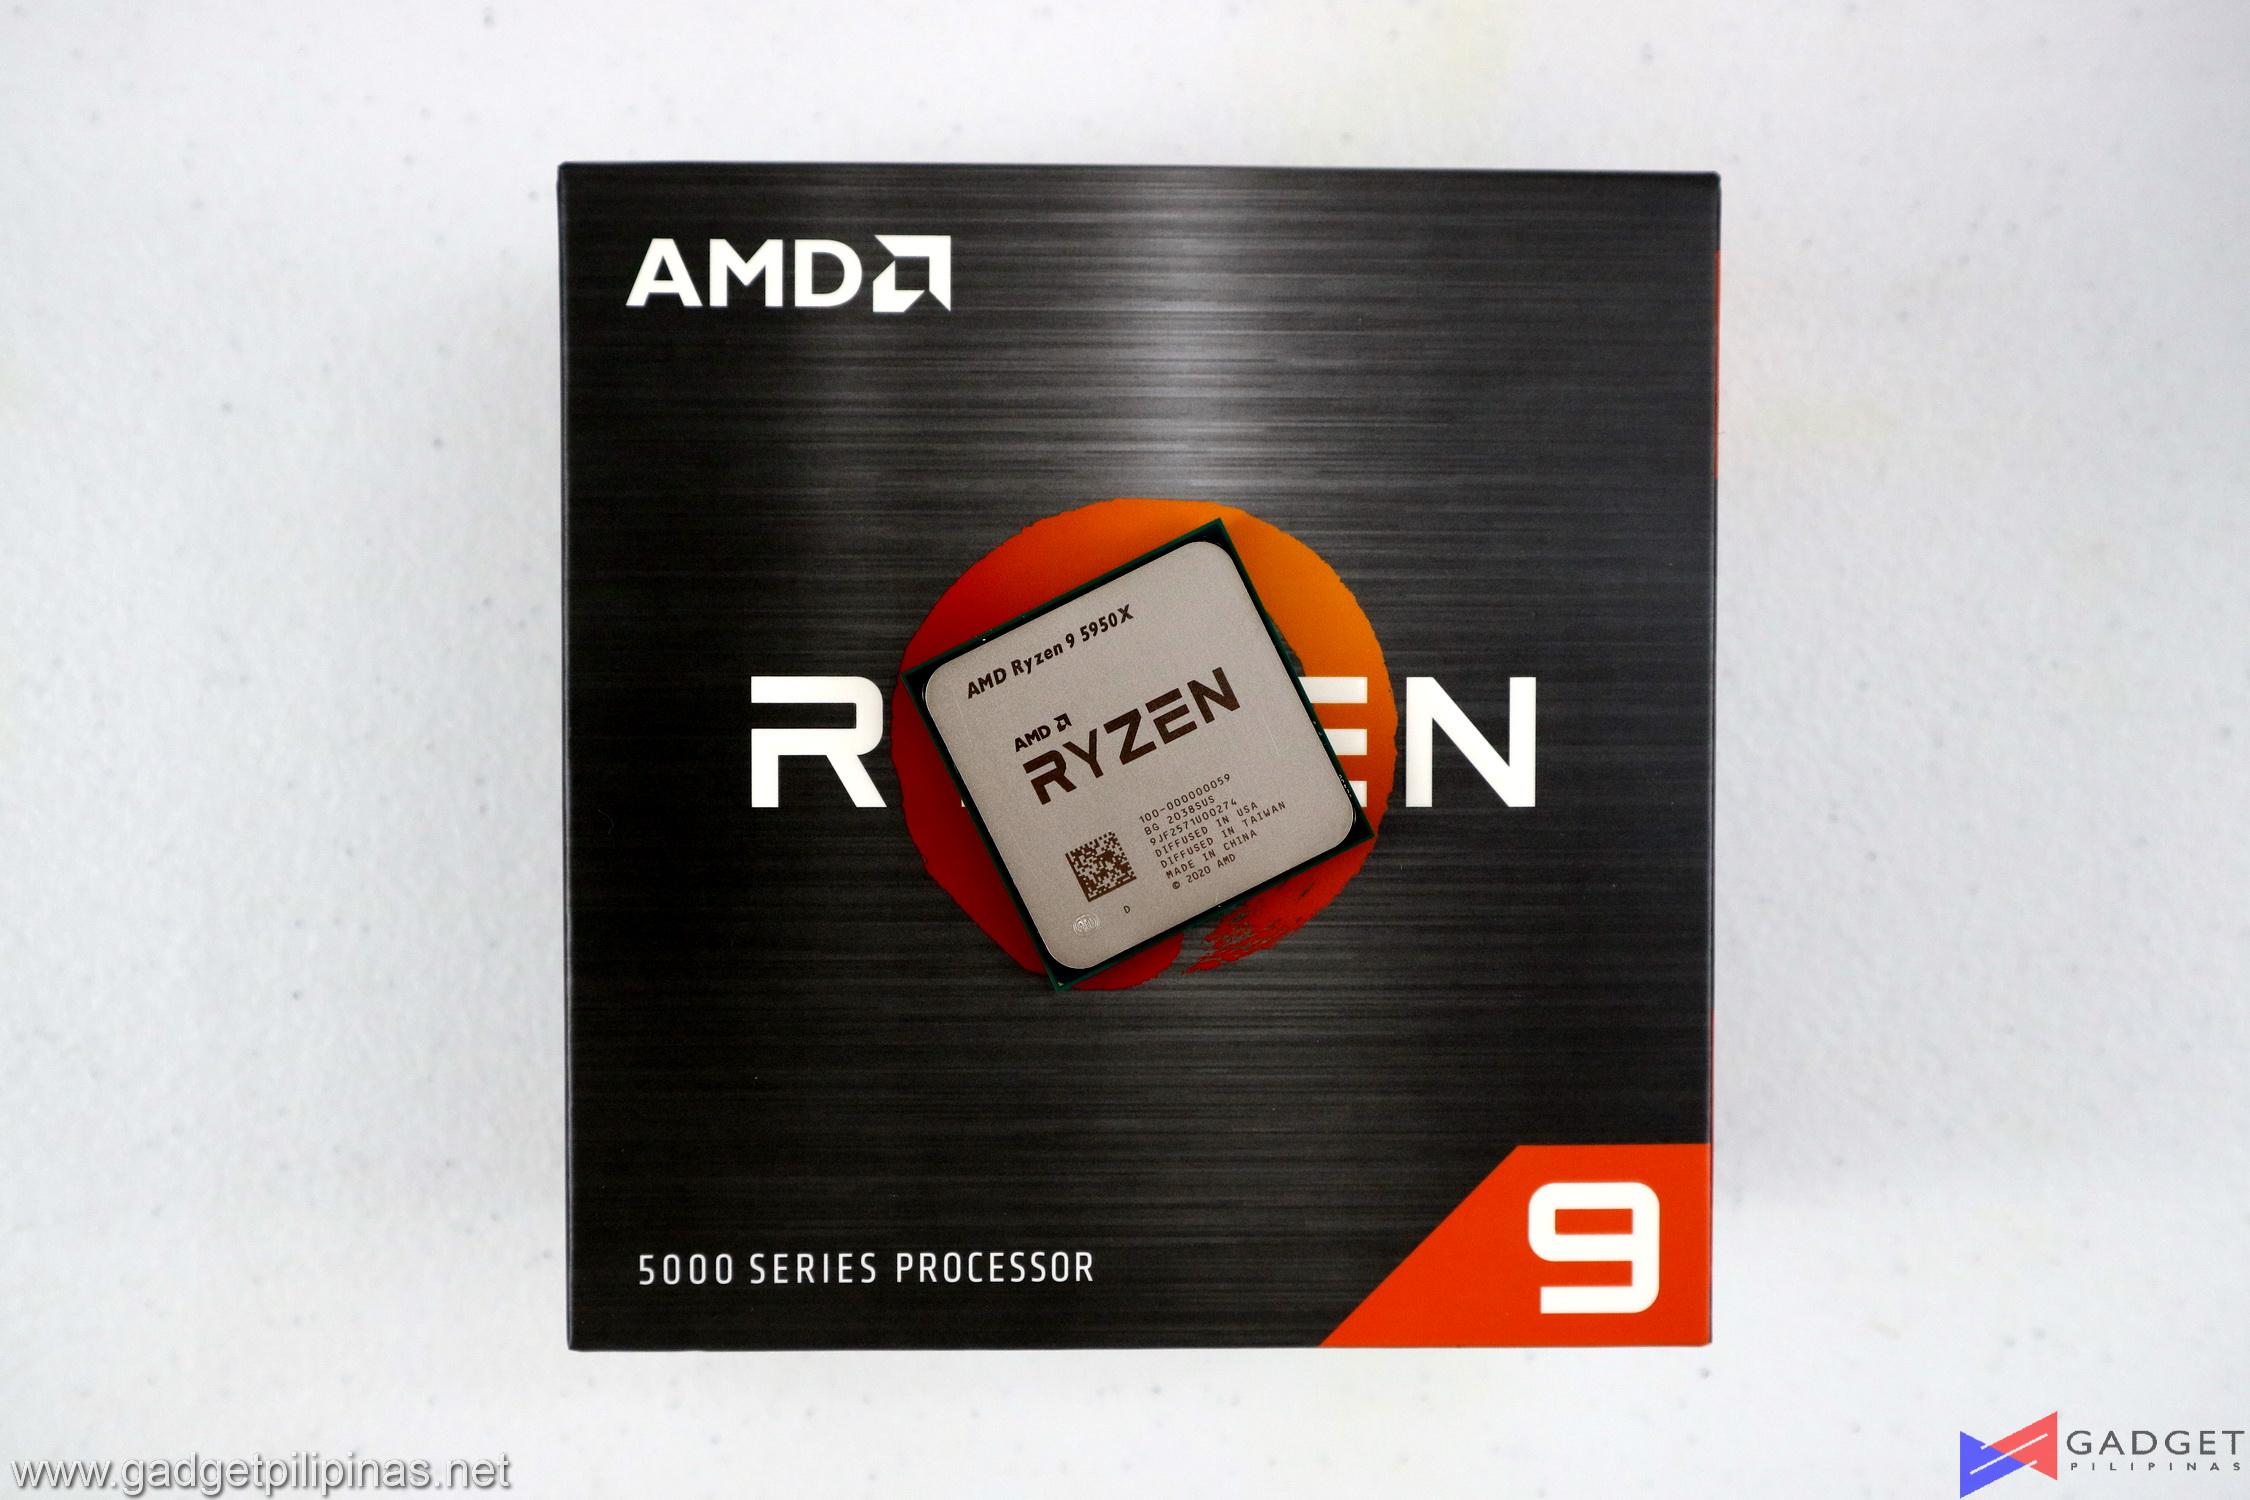 AMD Ryzen 9 5950X Review - AMD Ryzen 9 5950X PH Price Review